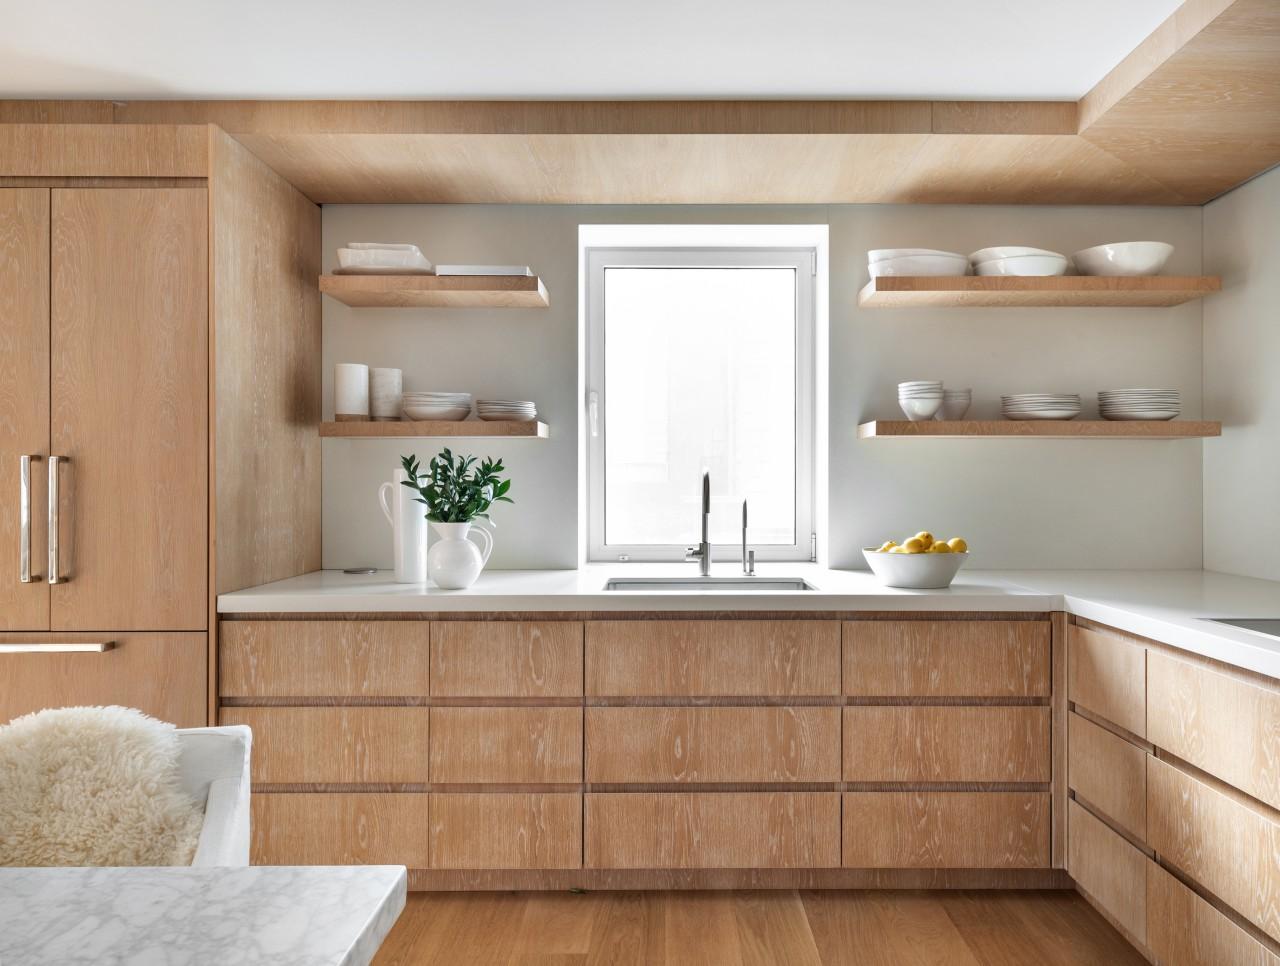 A kitchen window ensures plenty of natural light